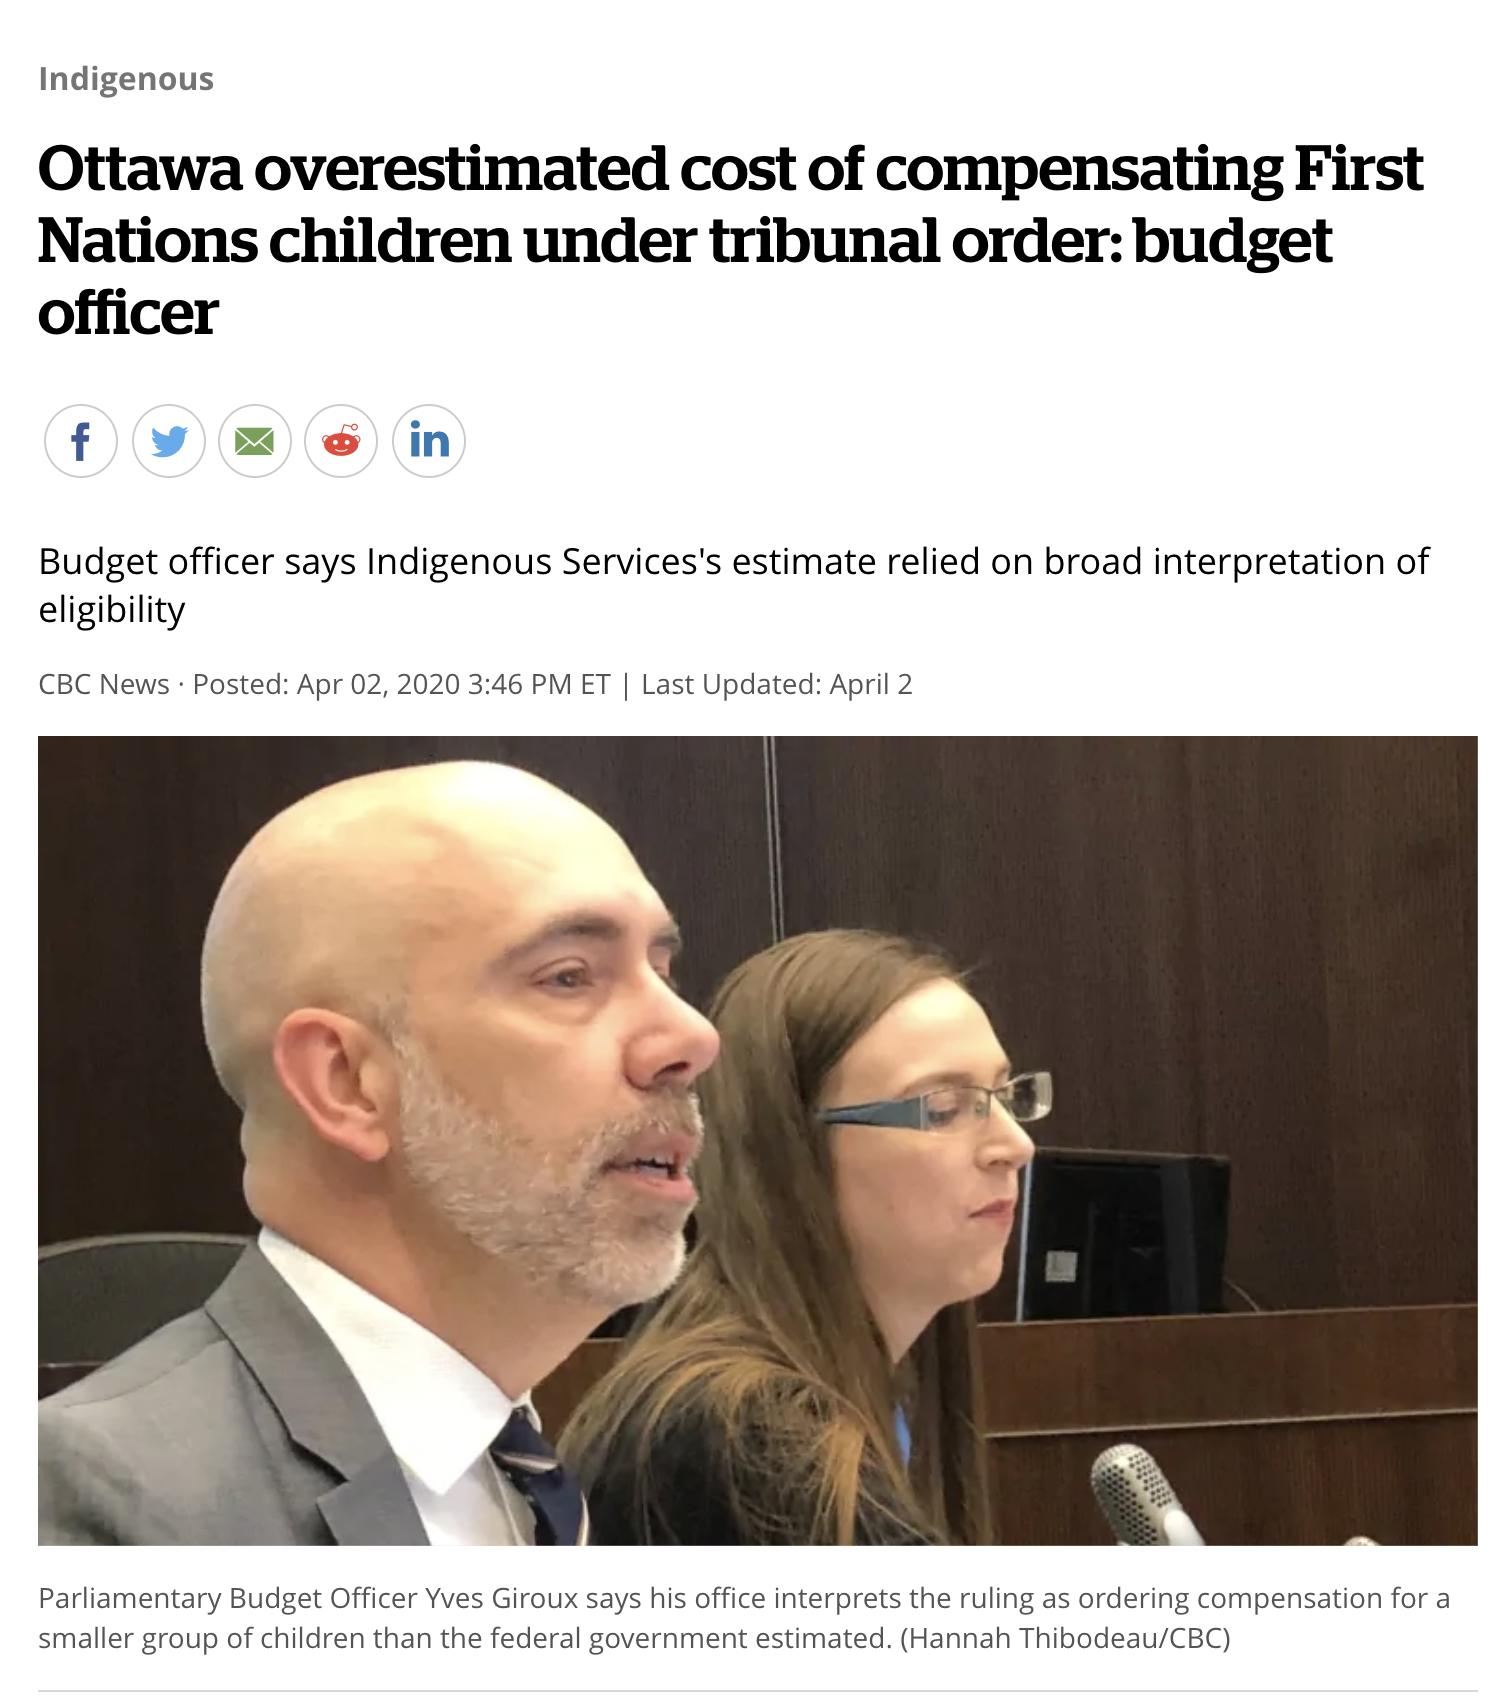 CBC News - Apr 2, 2020